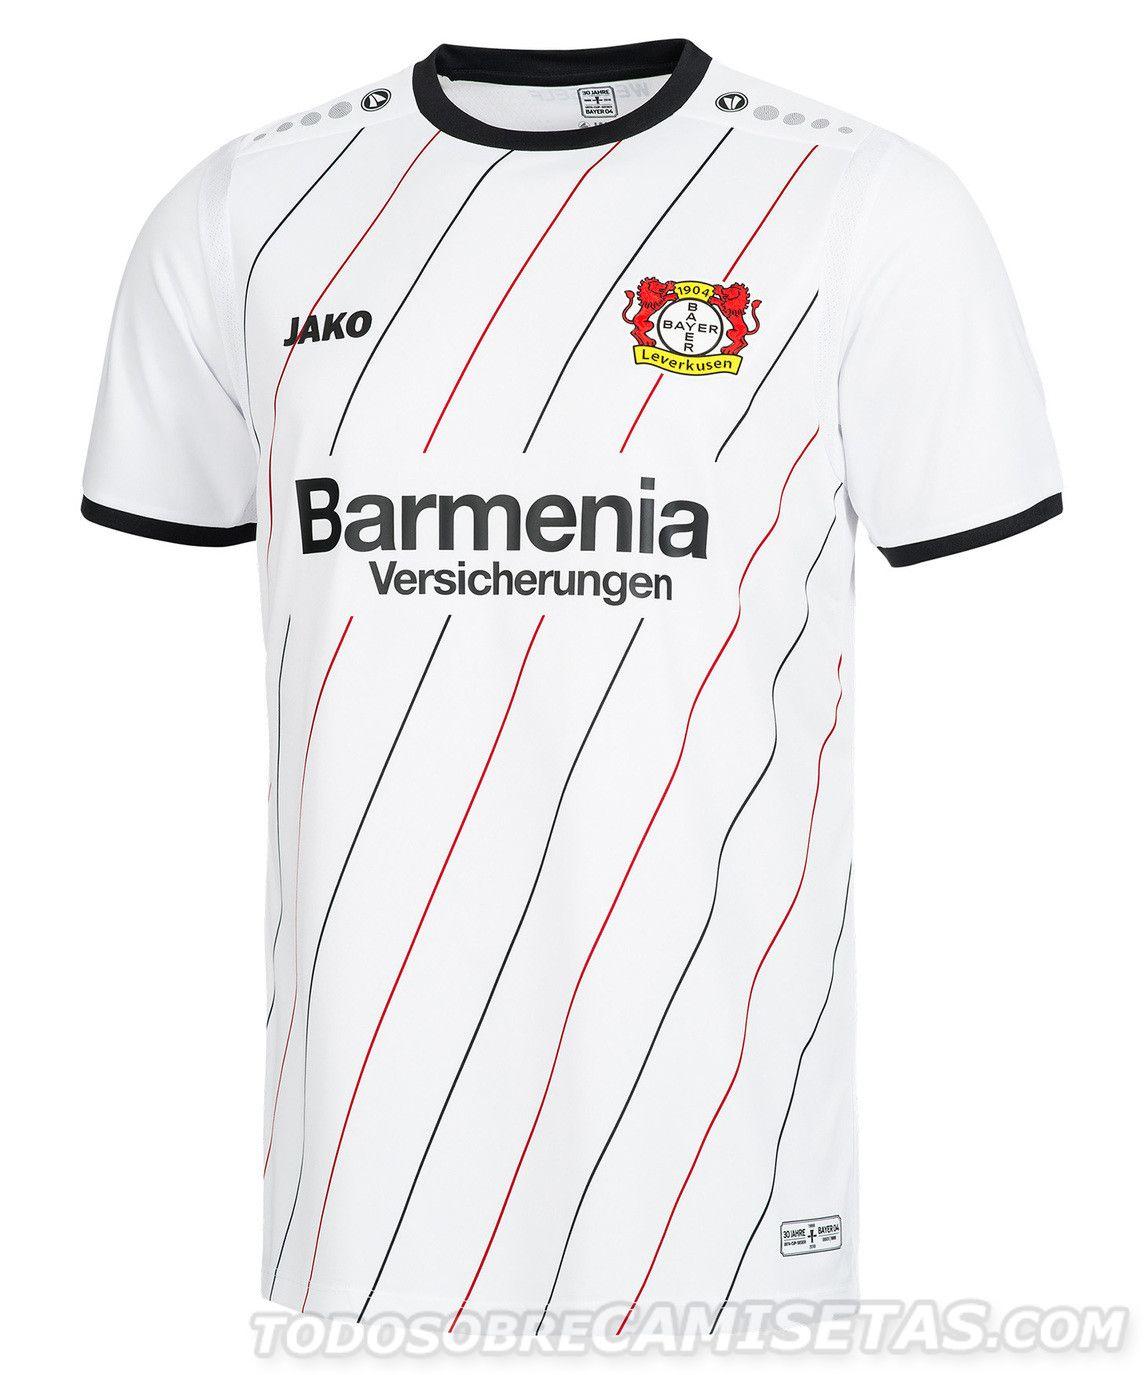 Bayer Leverkusen 2018 Jako UEFA Cup Winners 30th Anniversary Kit ... 9c50c220a005a